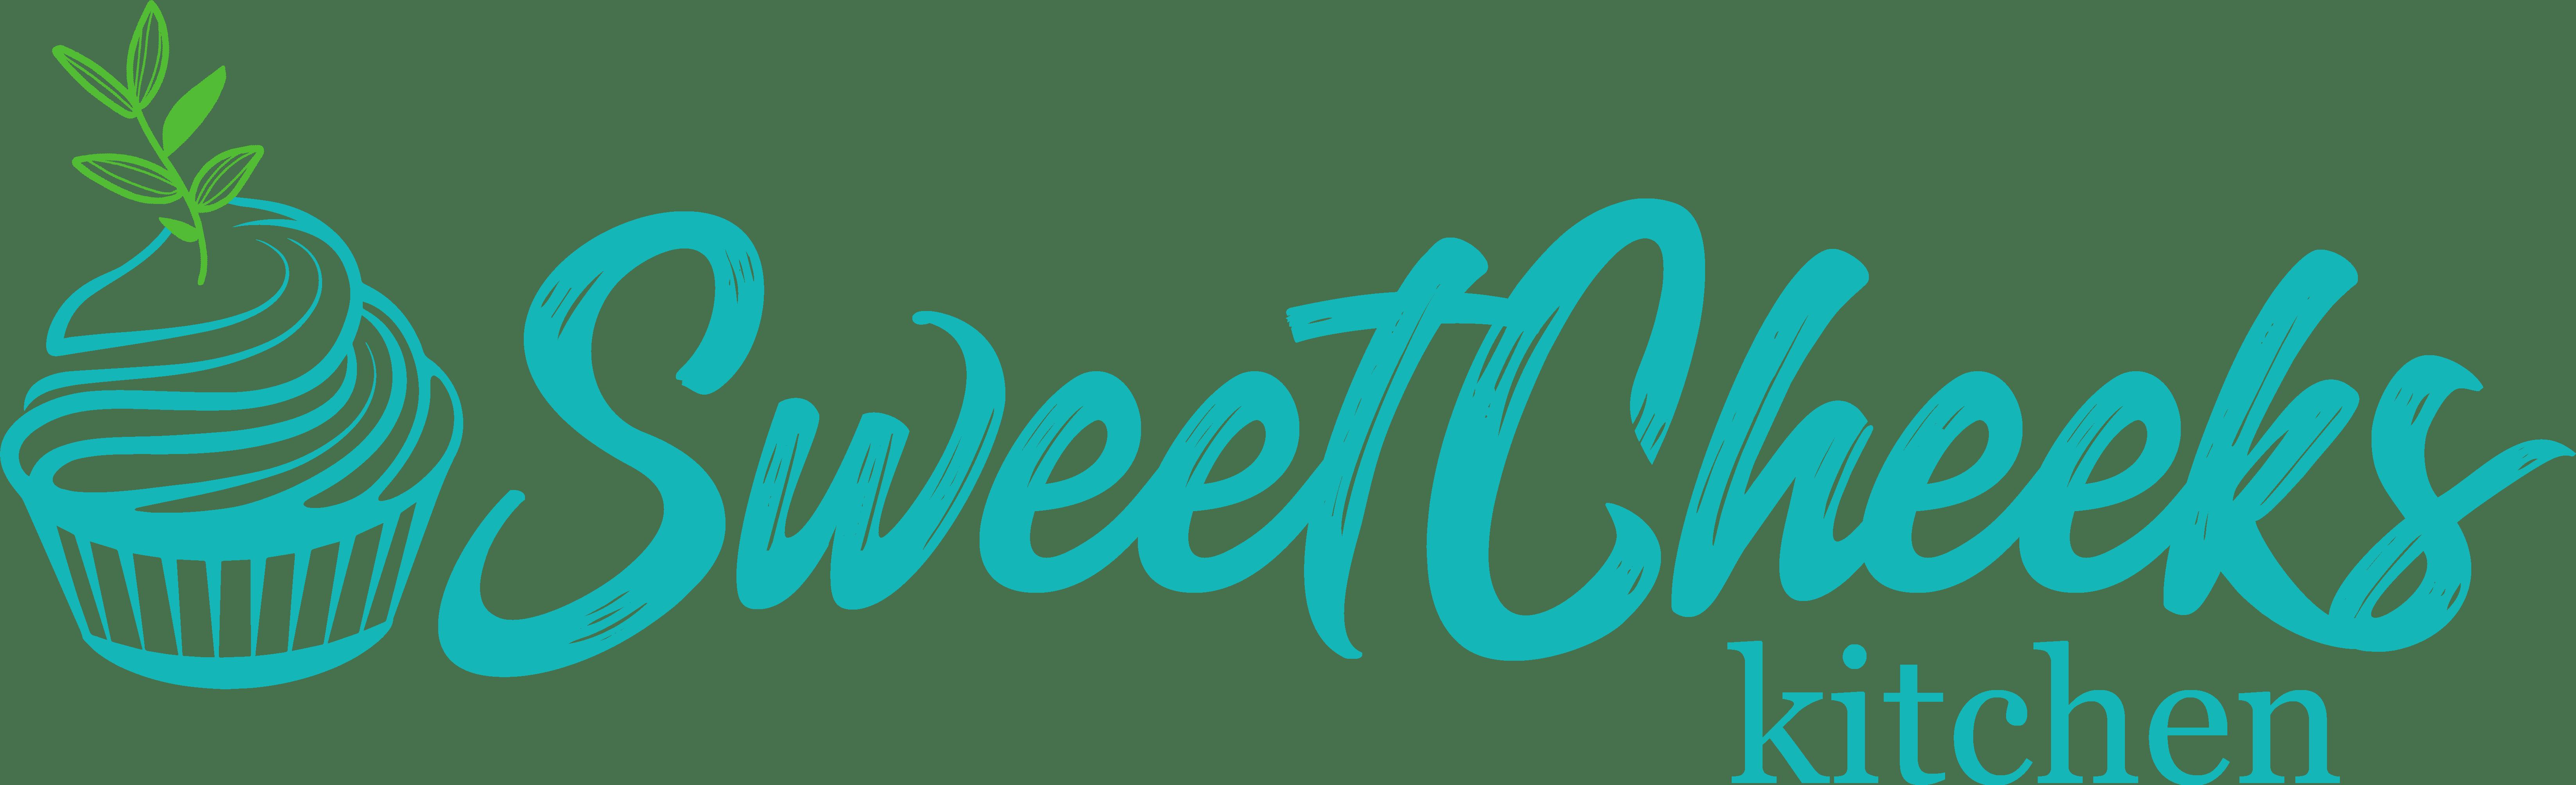 SweetCheeks Kitchen Logo